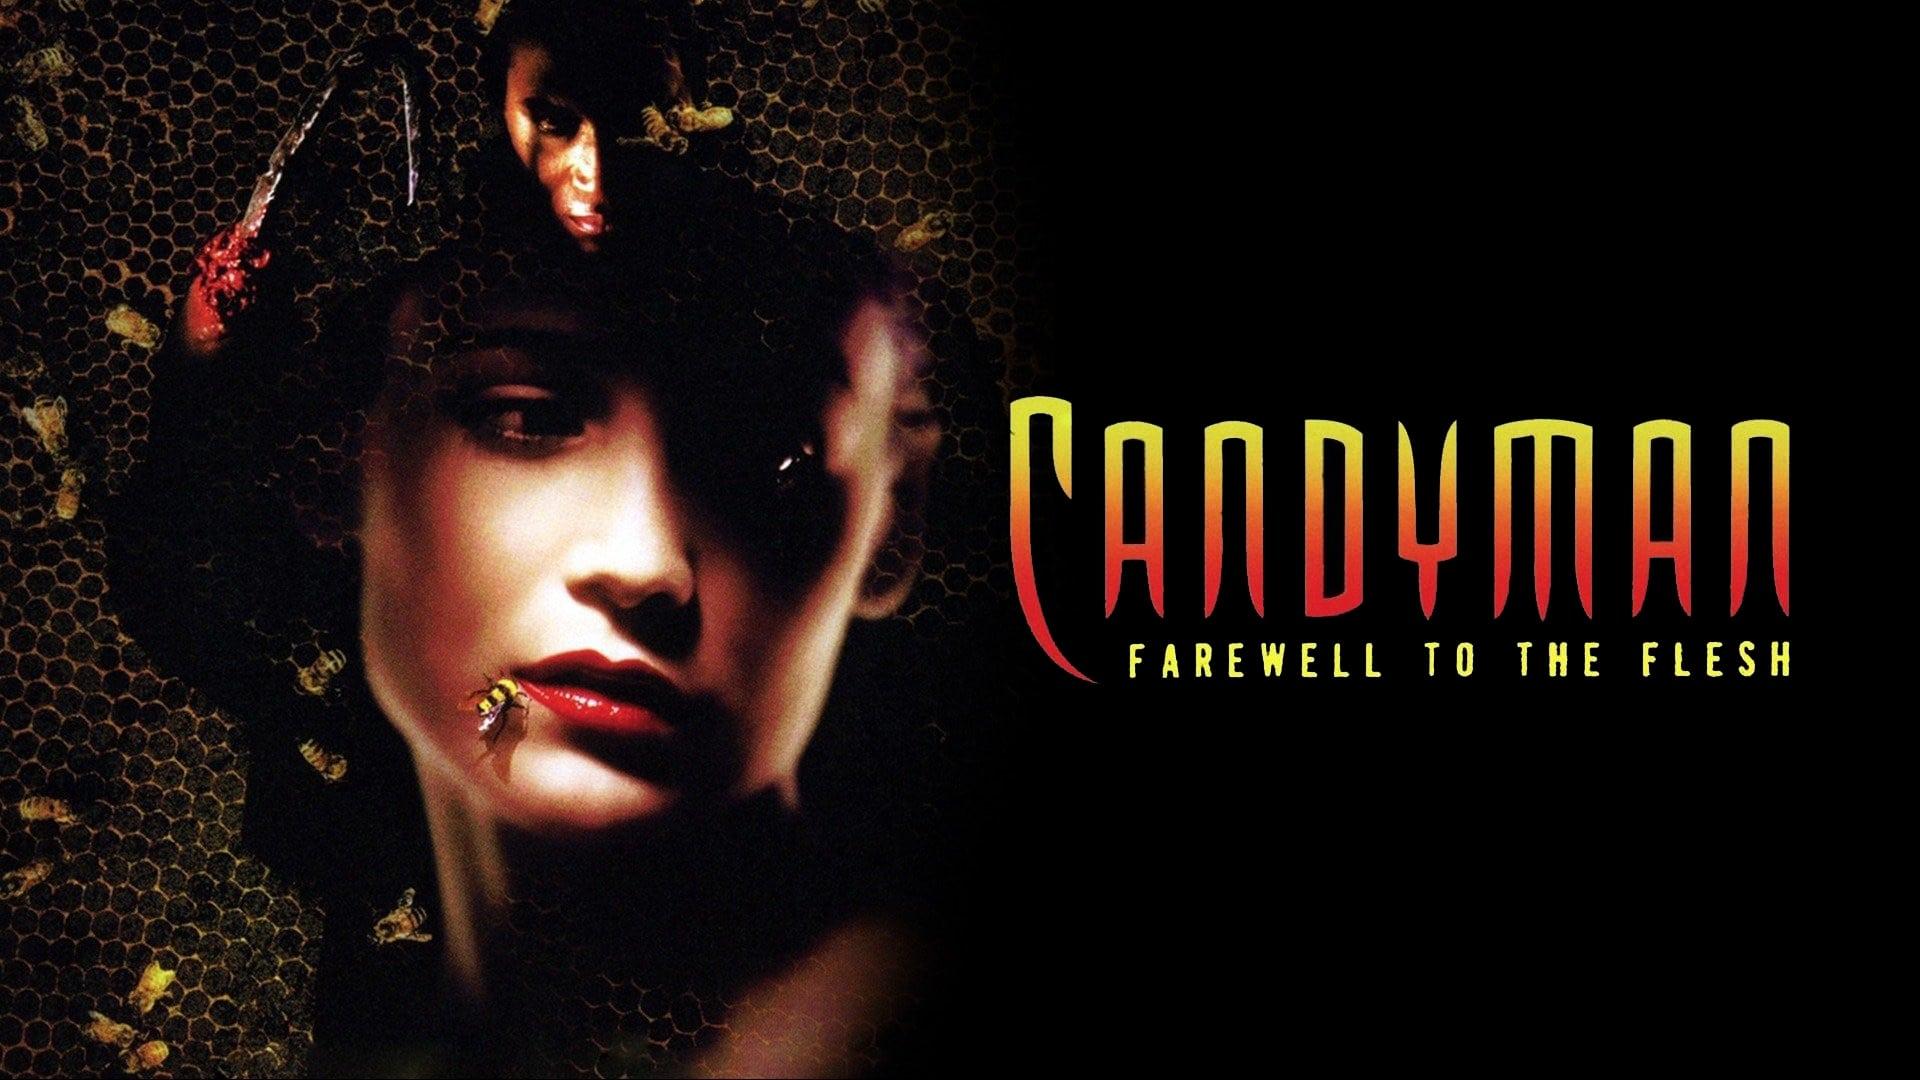 Candyman: Farewell to the Flesh Trailer